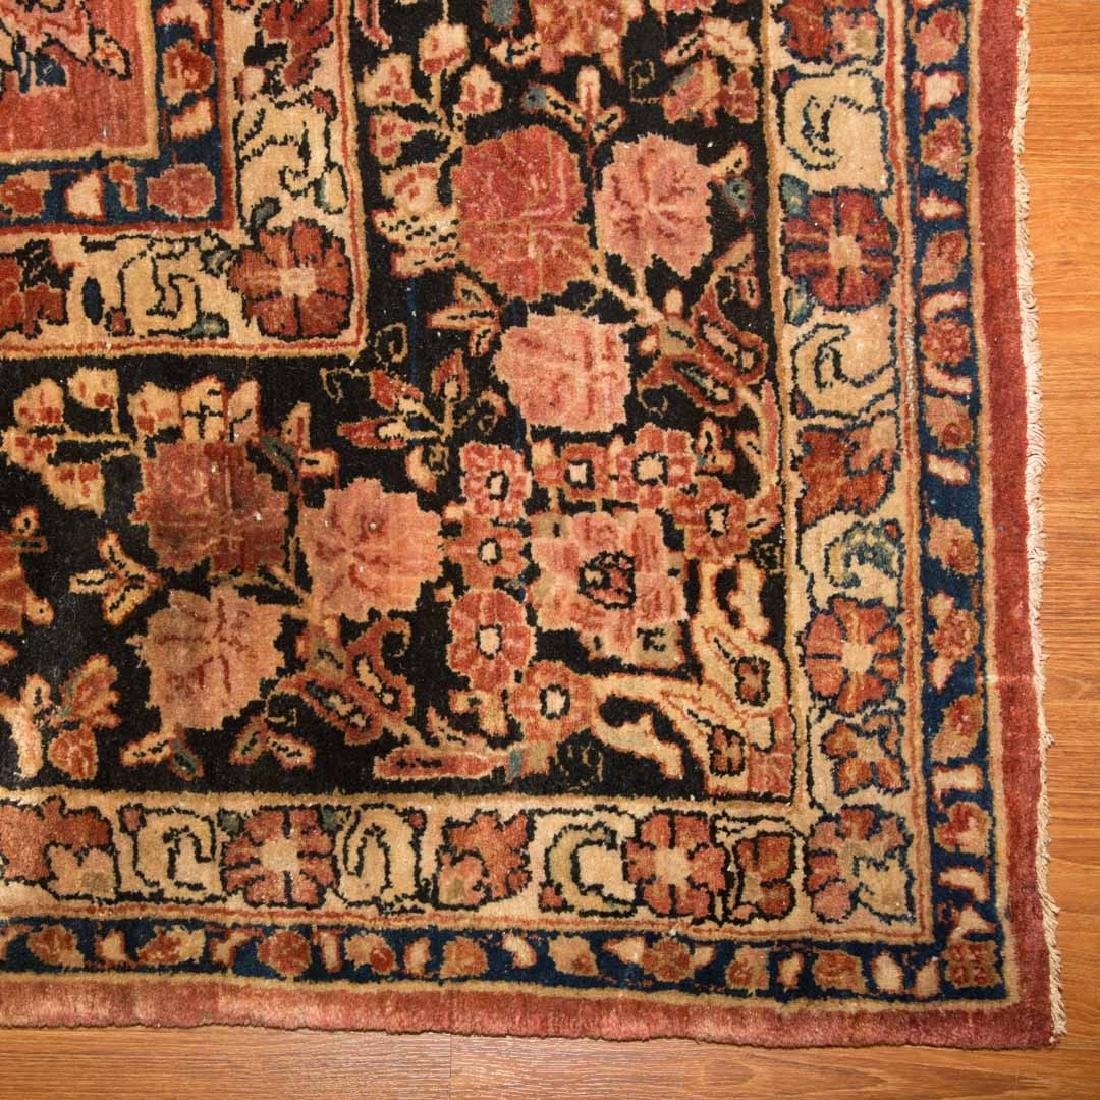 Antique Sarouk carpet, approx. 10.1 x 16.8 - 2